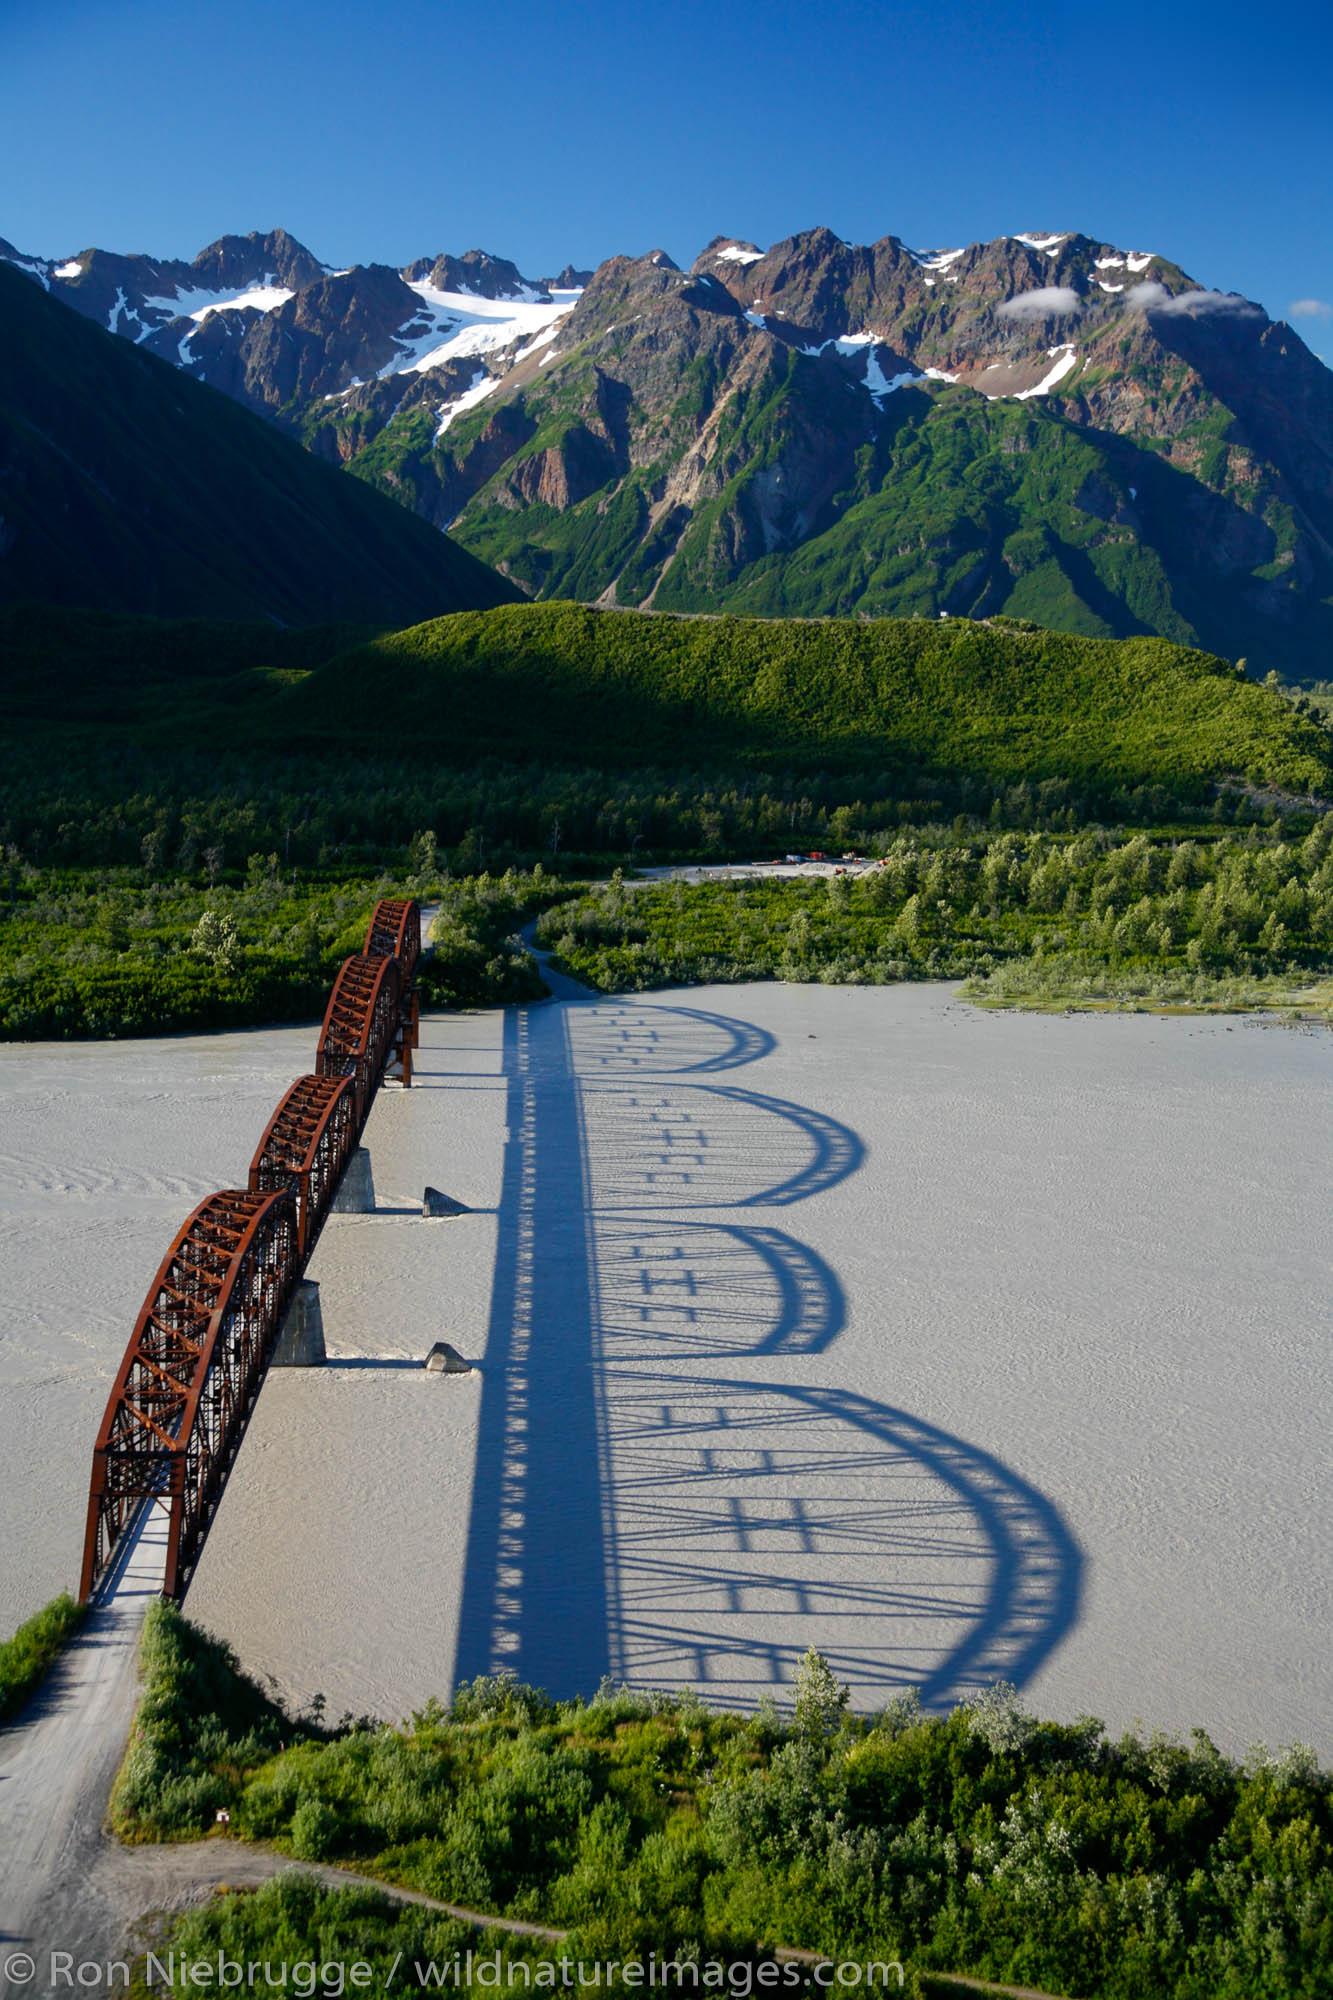 Aerial, Million Dollar Bridge crossing the Copper River, Chugach National Forest near Cordova, Alaska.